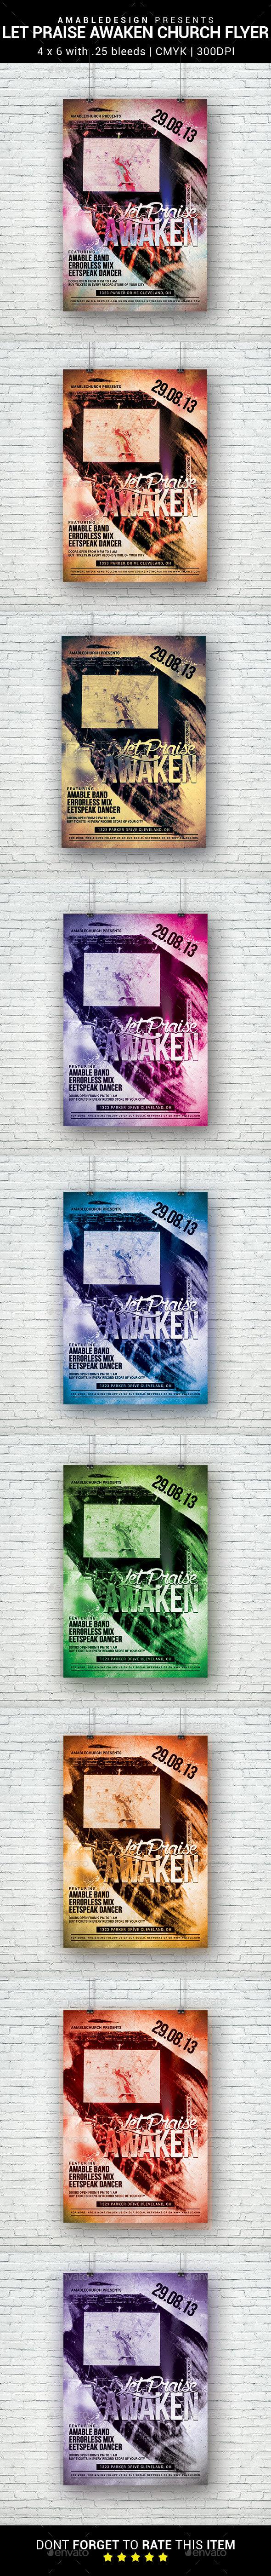 Let Praise Awaken Church Flyer - Church Flyers